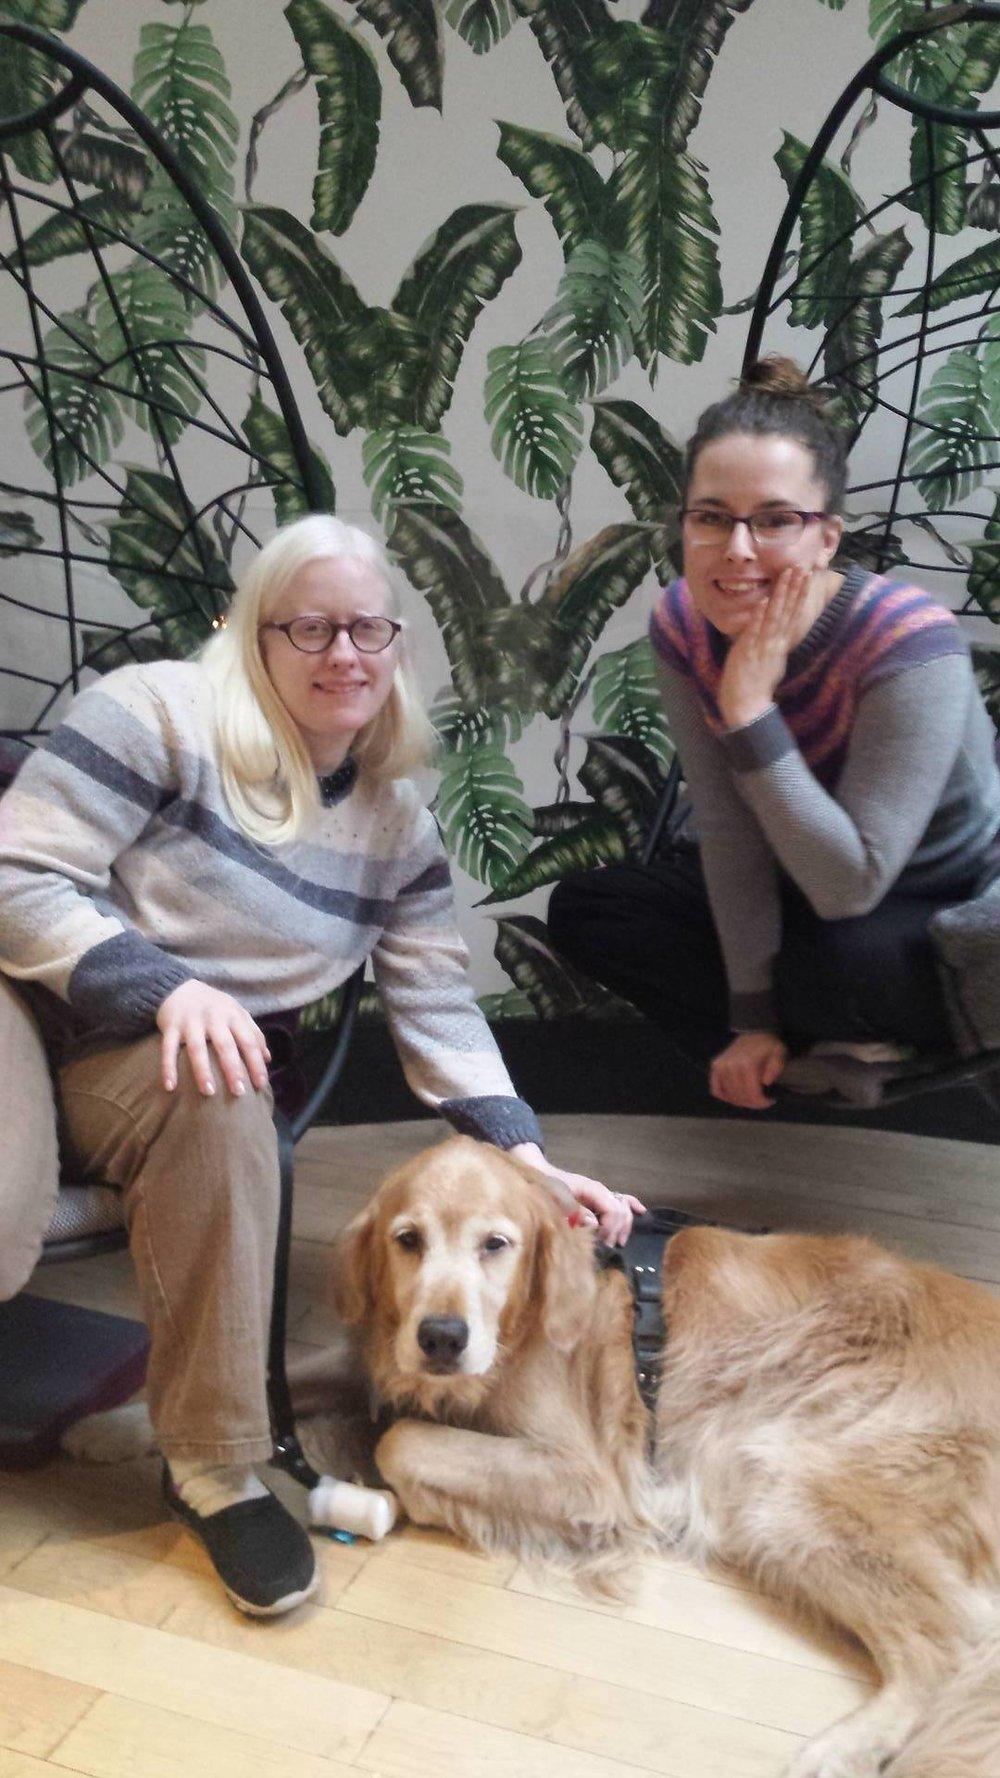 Reviewers: Tasha, Karlie and Credit